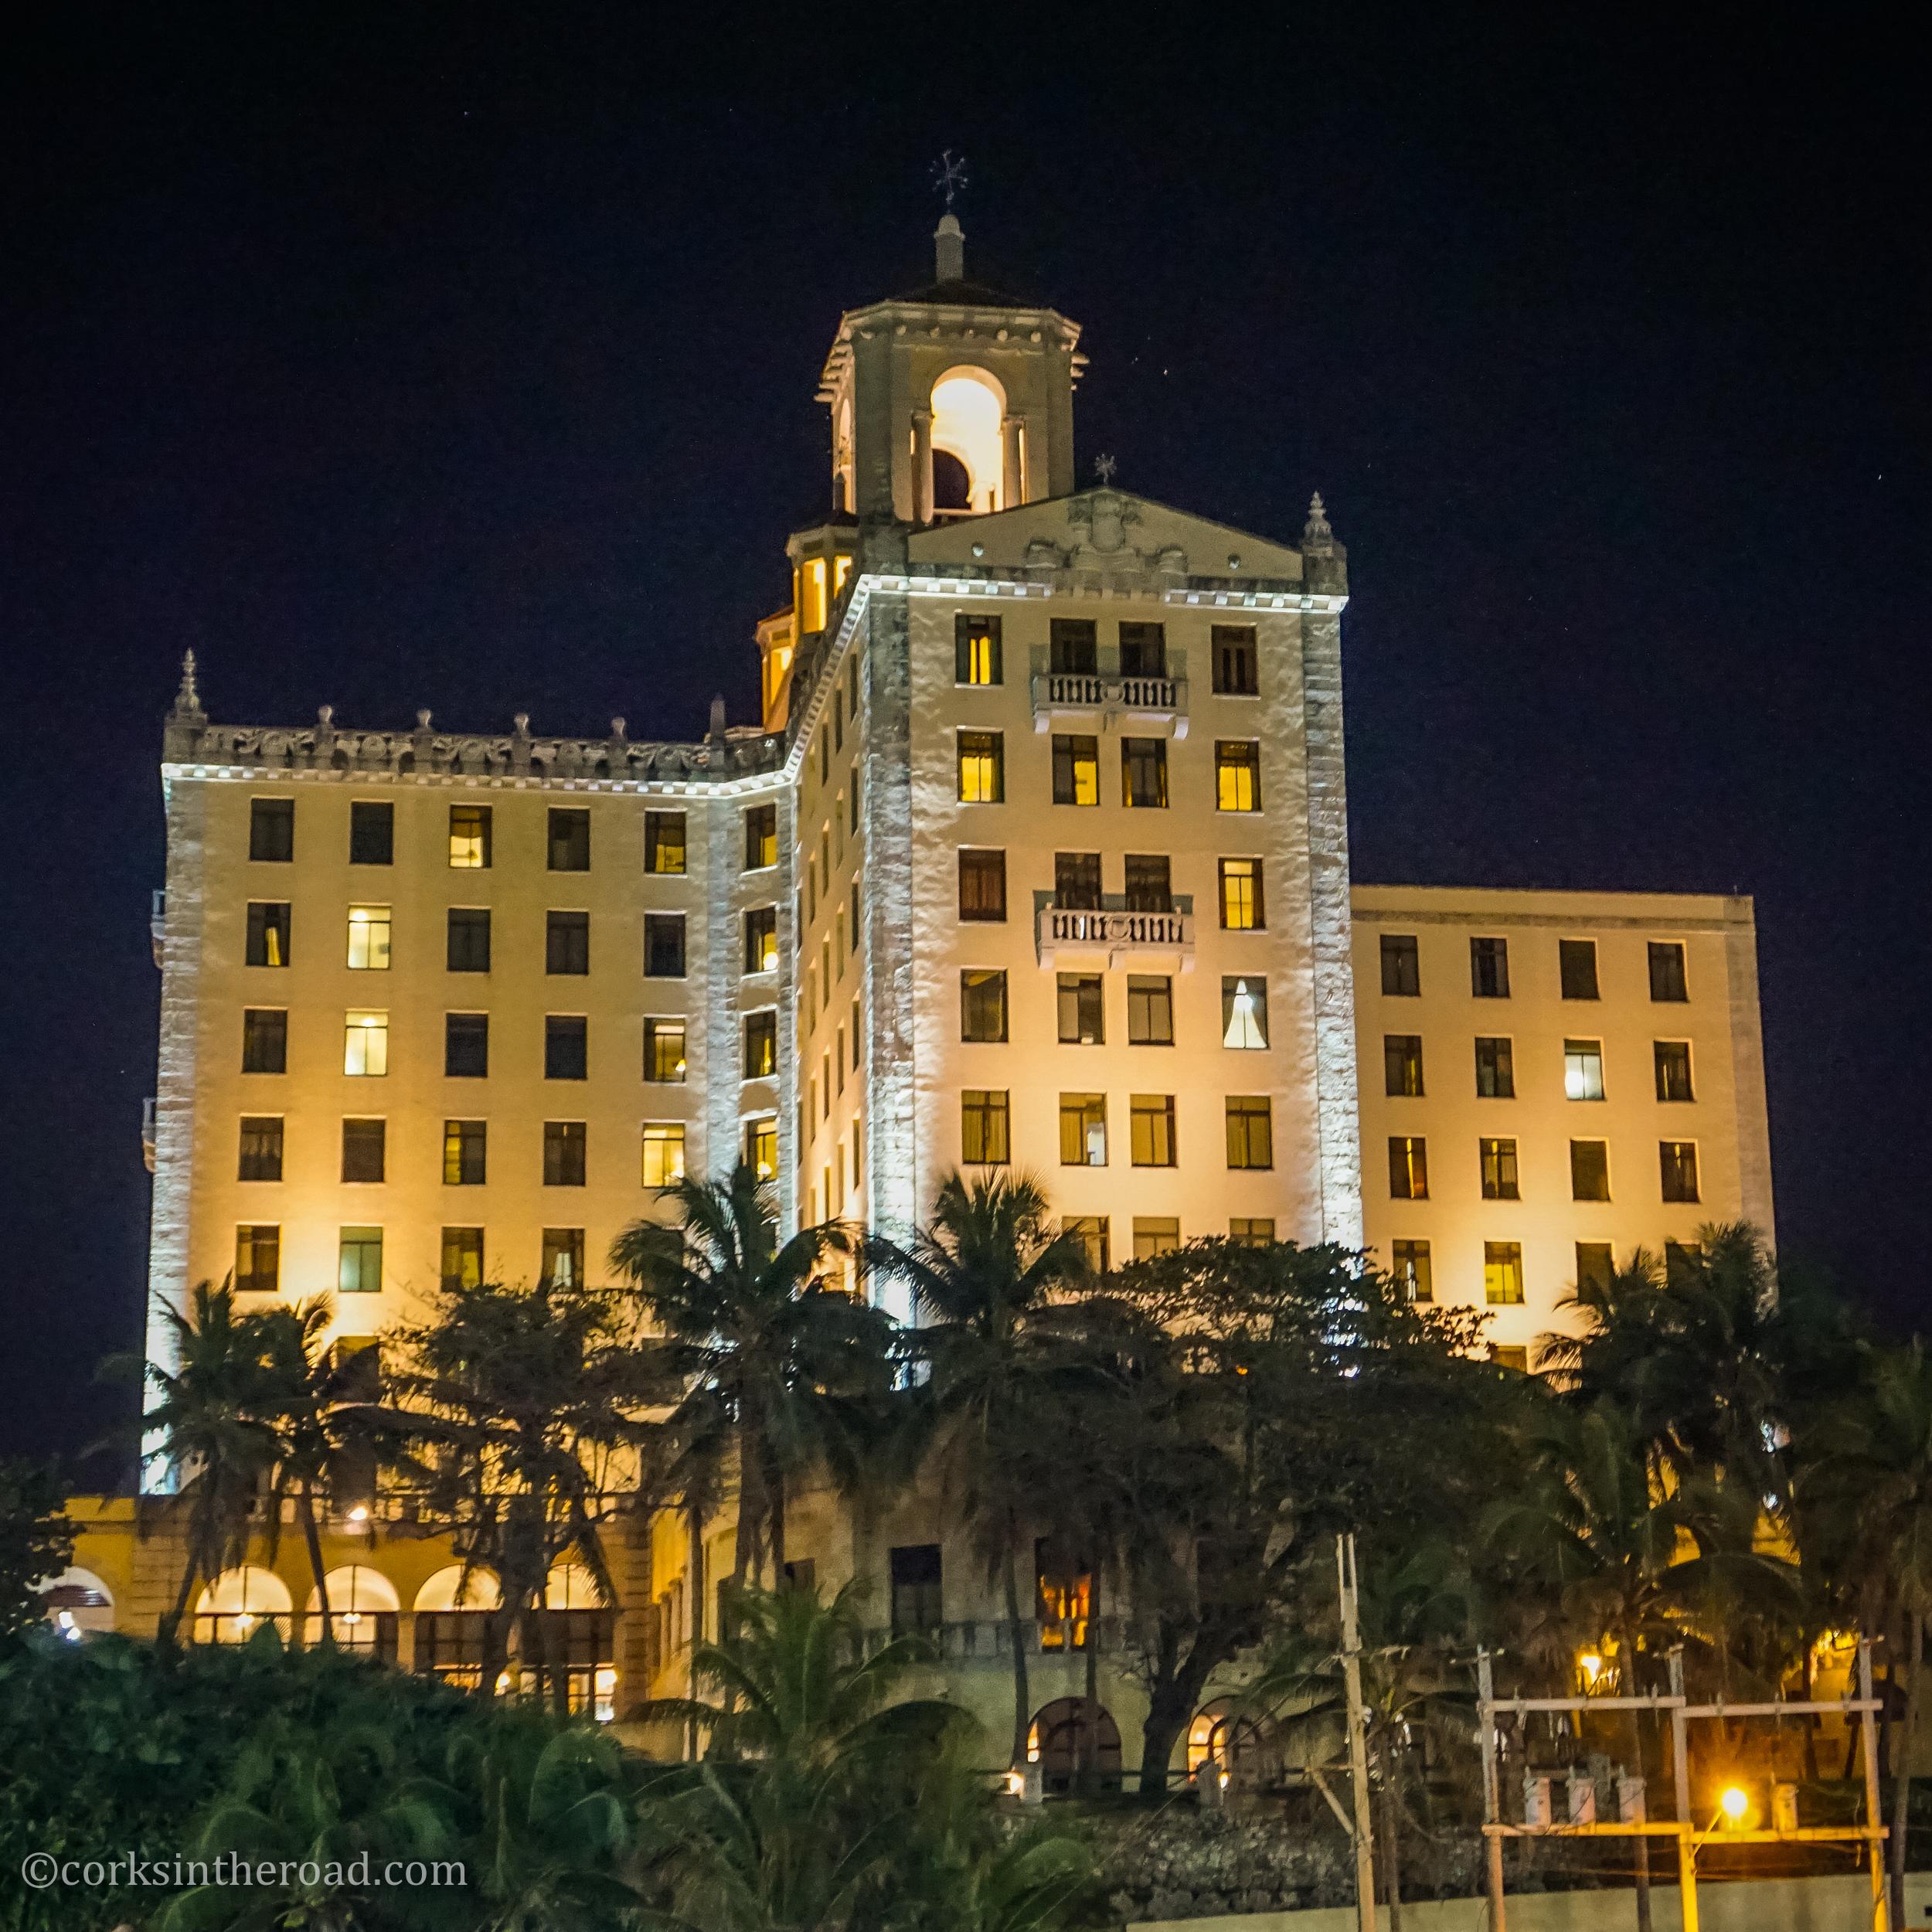 Architecture, Corksintheroad, Cuba, Havana-24.jpg